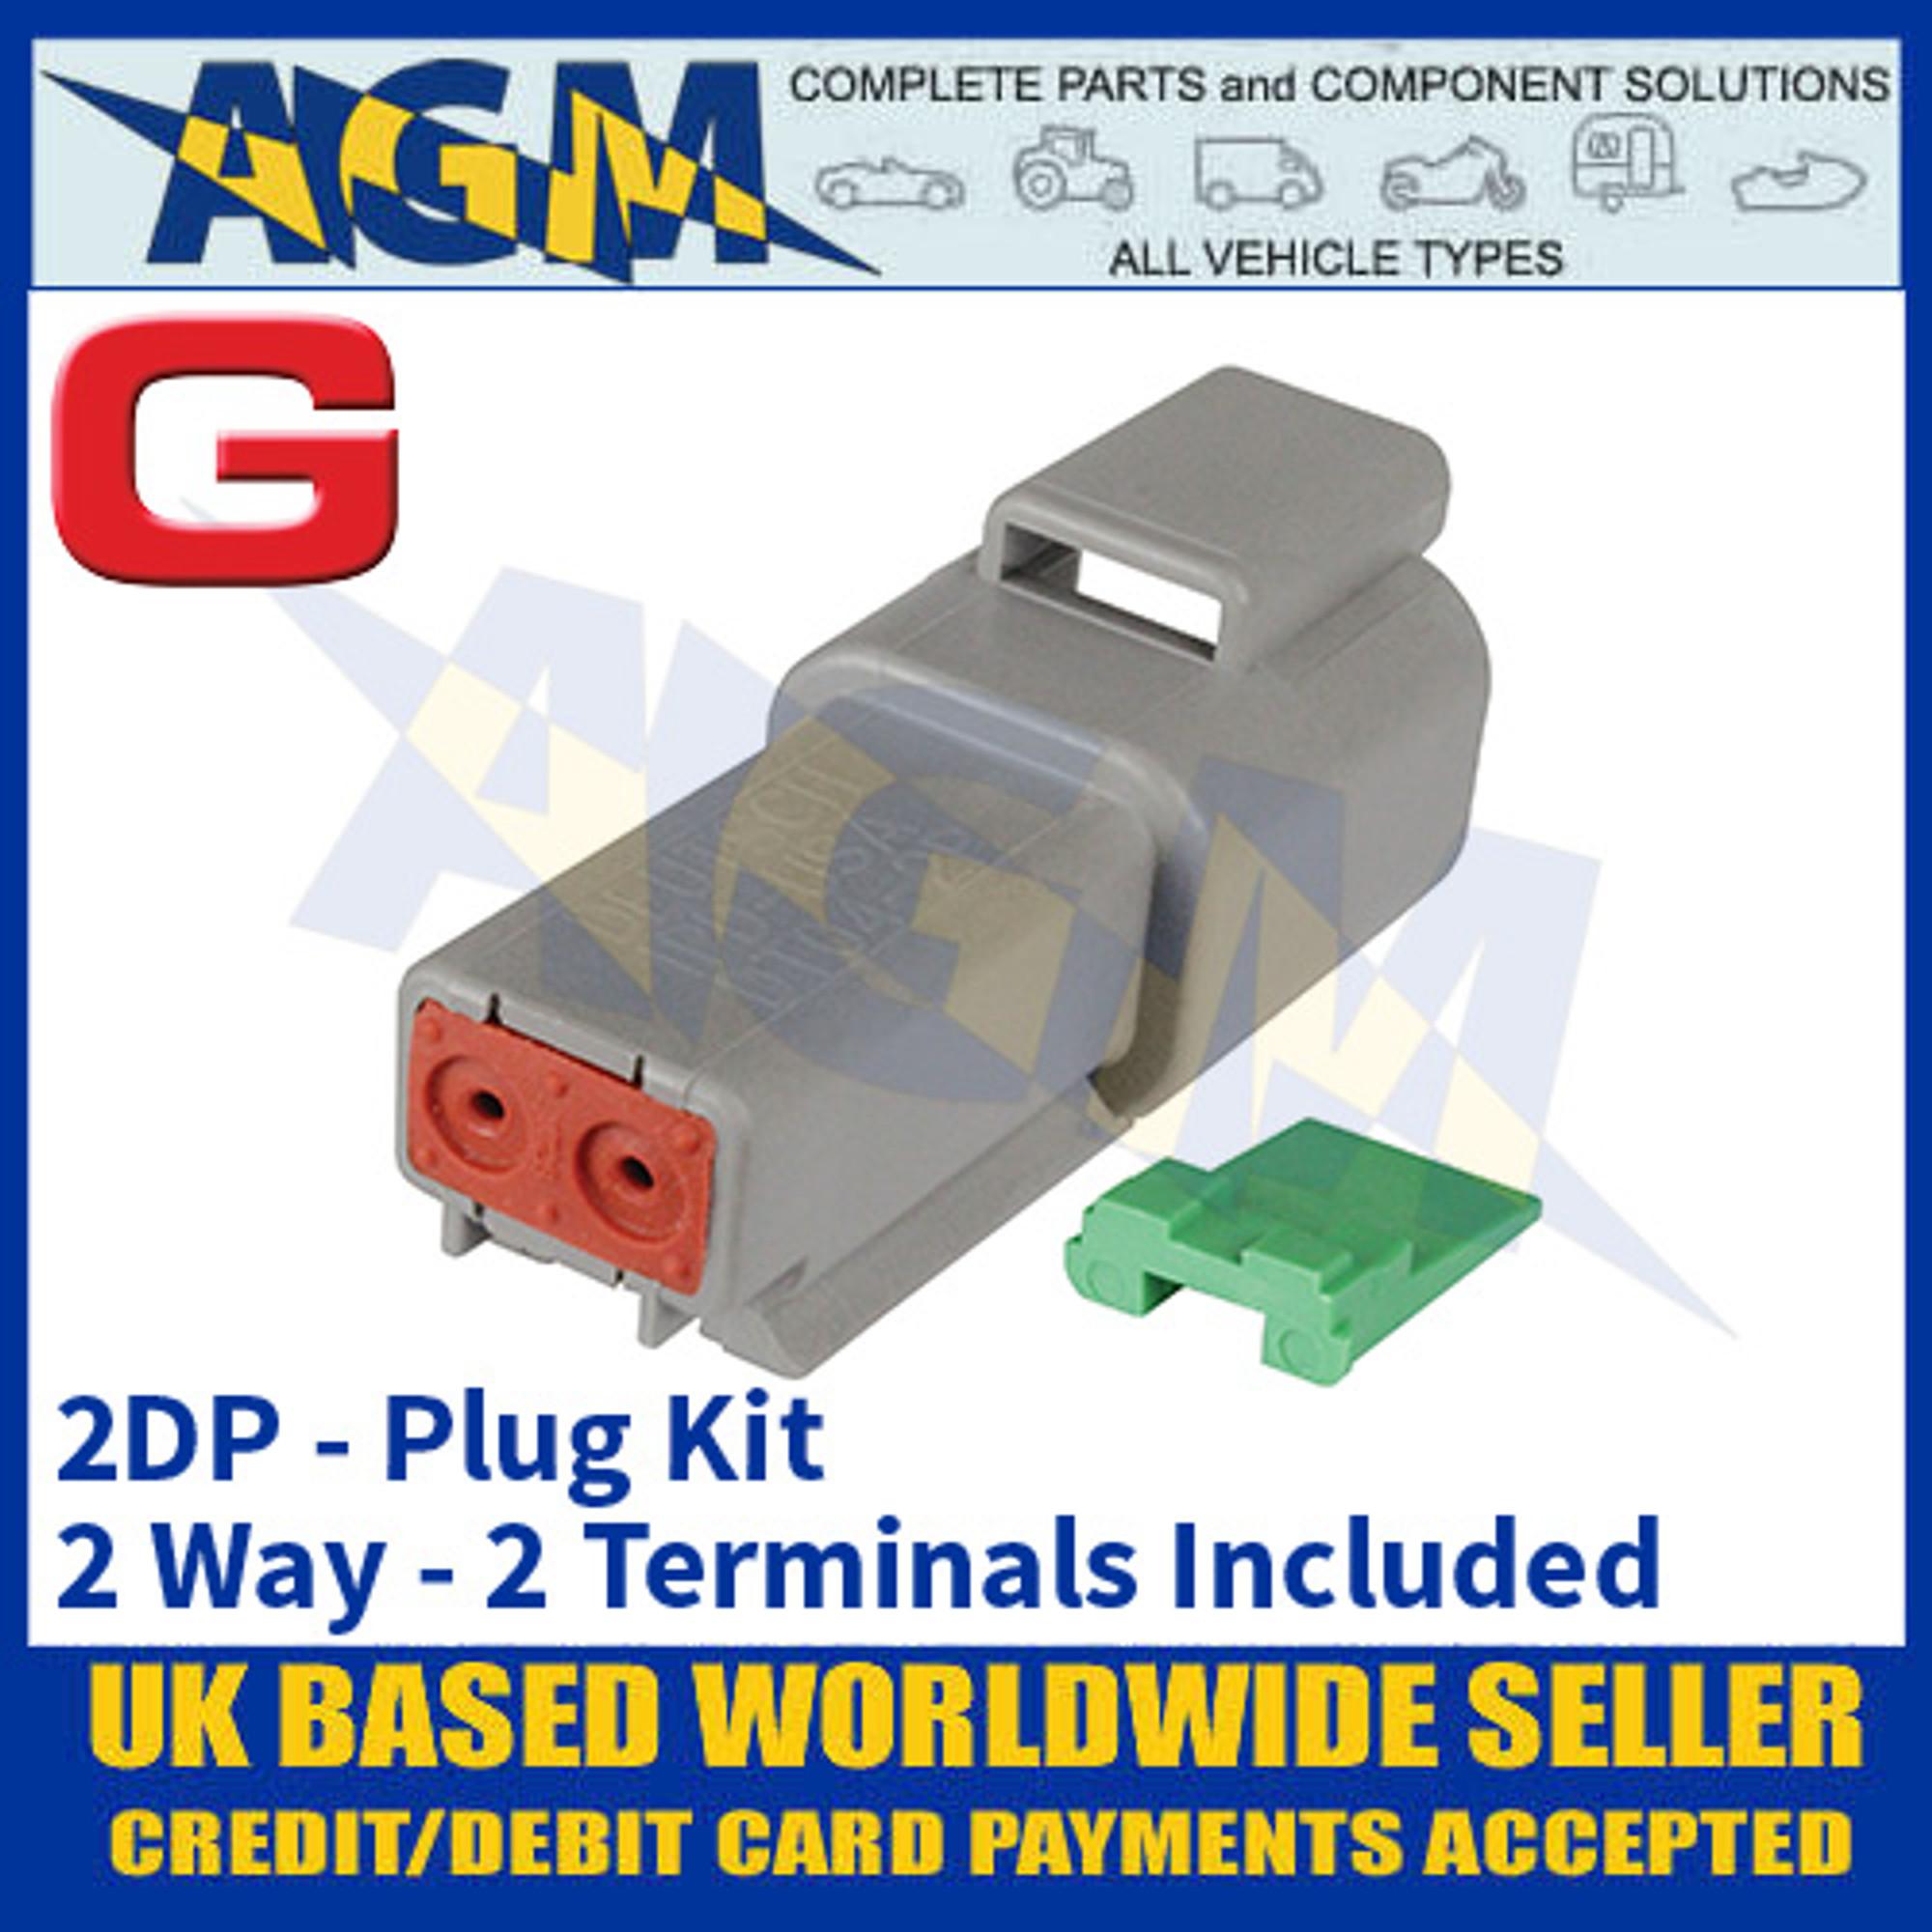 2 Terminals Included 2DP Plug Kit Deutsch /'DT/' Series Connector 2 Way